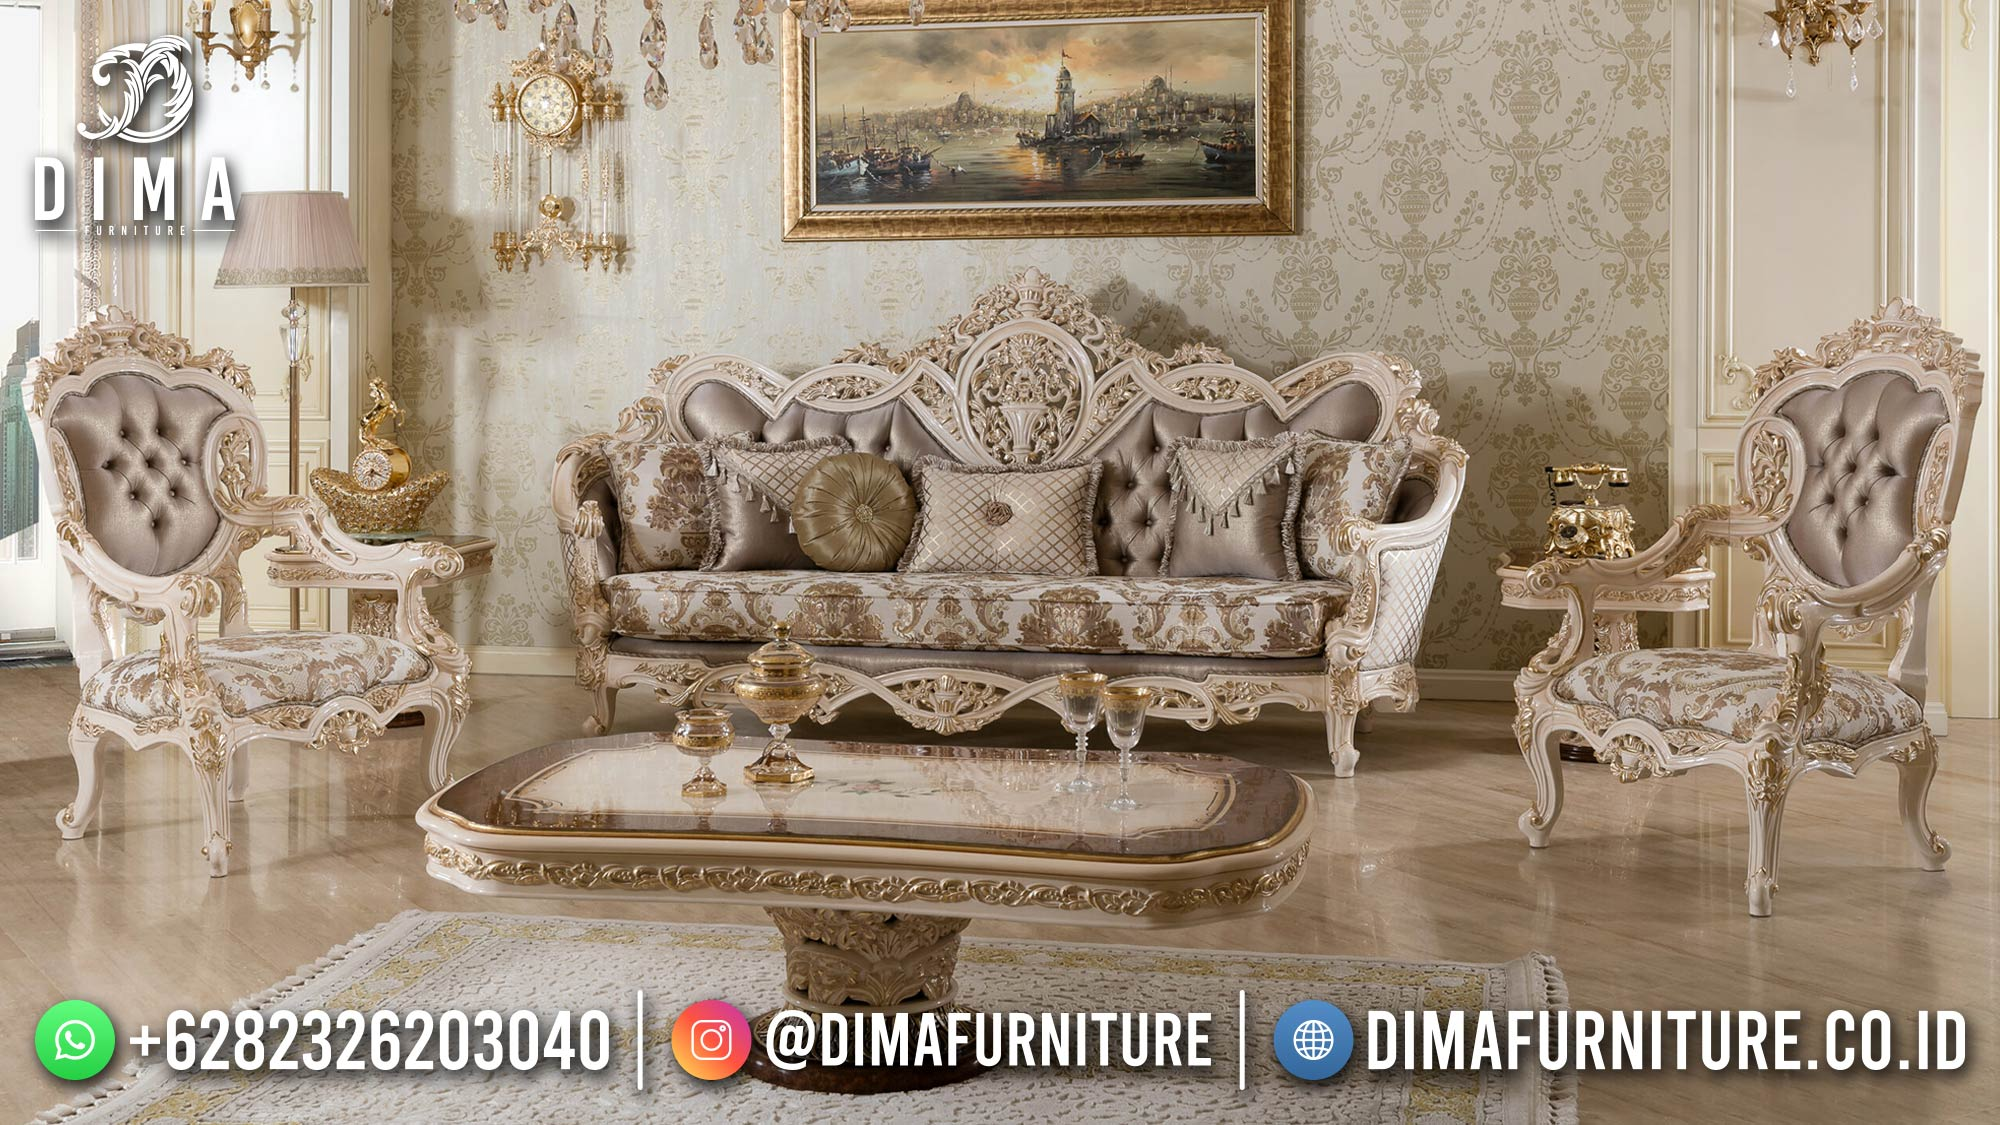 Best Sale Sofa Tamu Mewah Jepara Ukiran Luxury Baroque New Style ST-1429